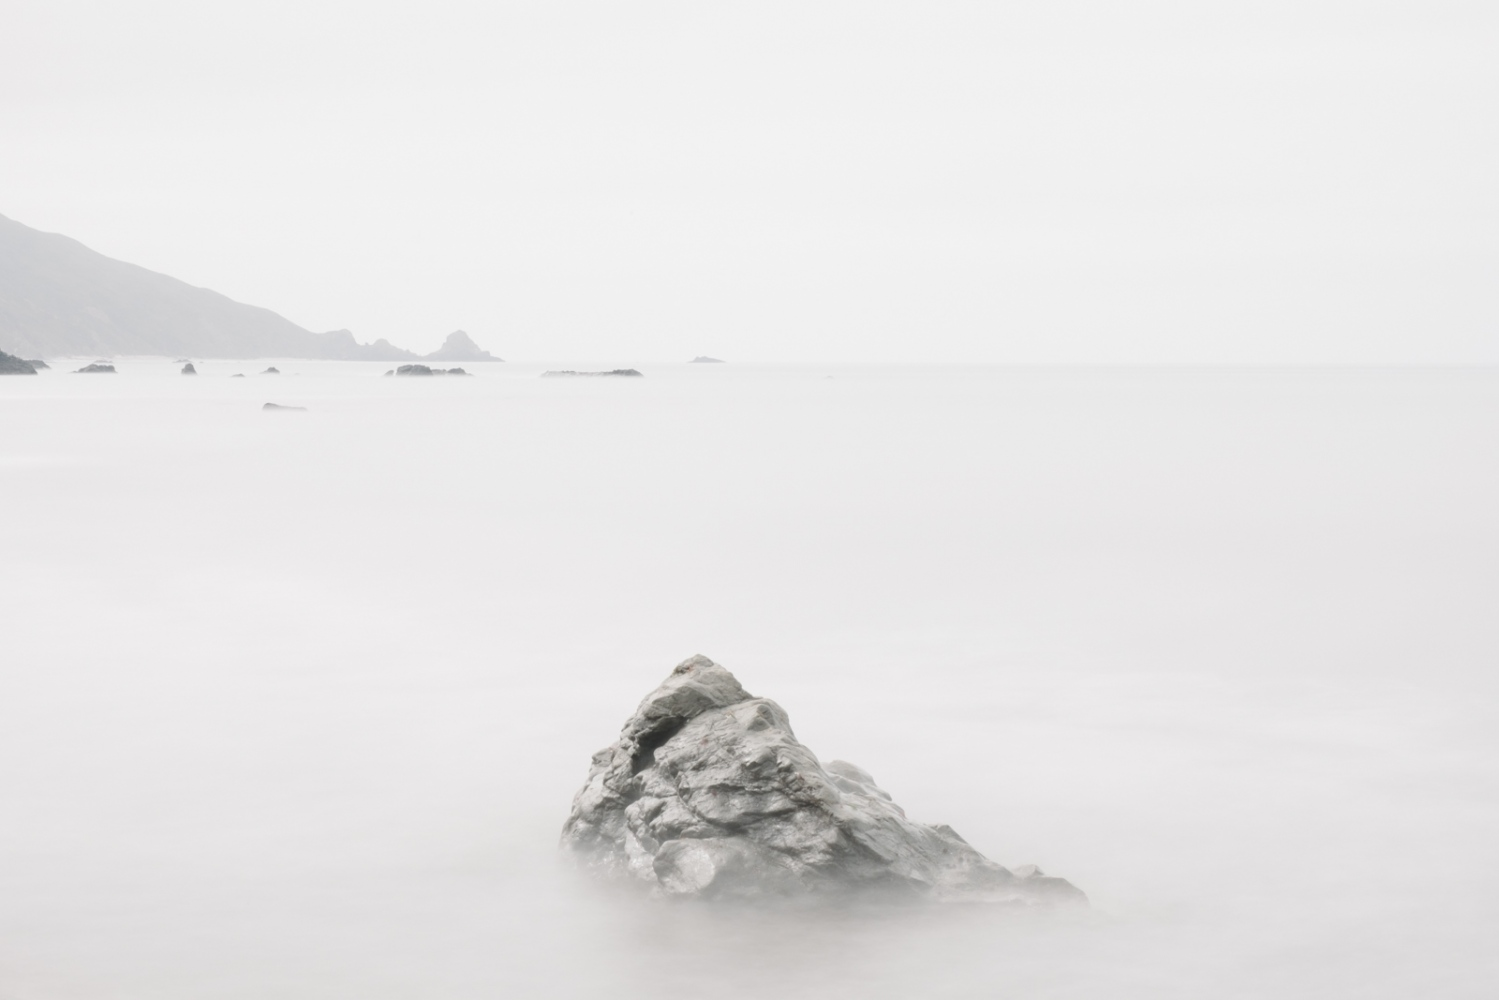 Art and Documentary Photography - Loading Matt_Propert_new landscapes-15.jpg